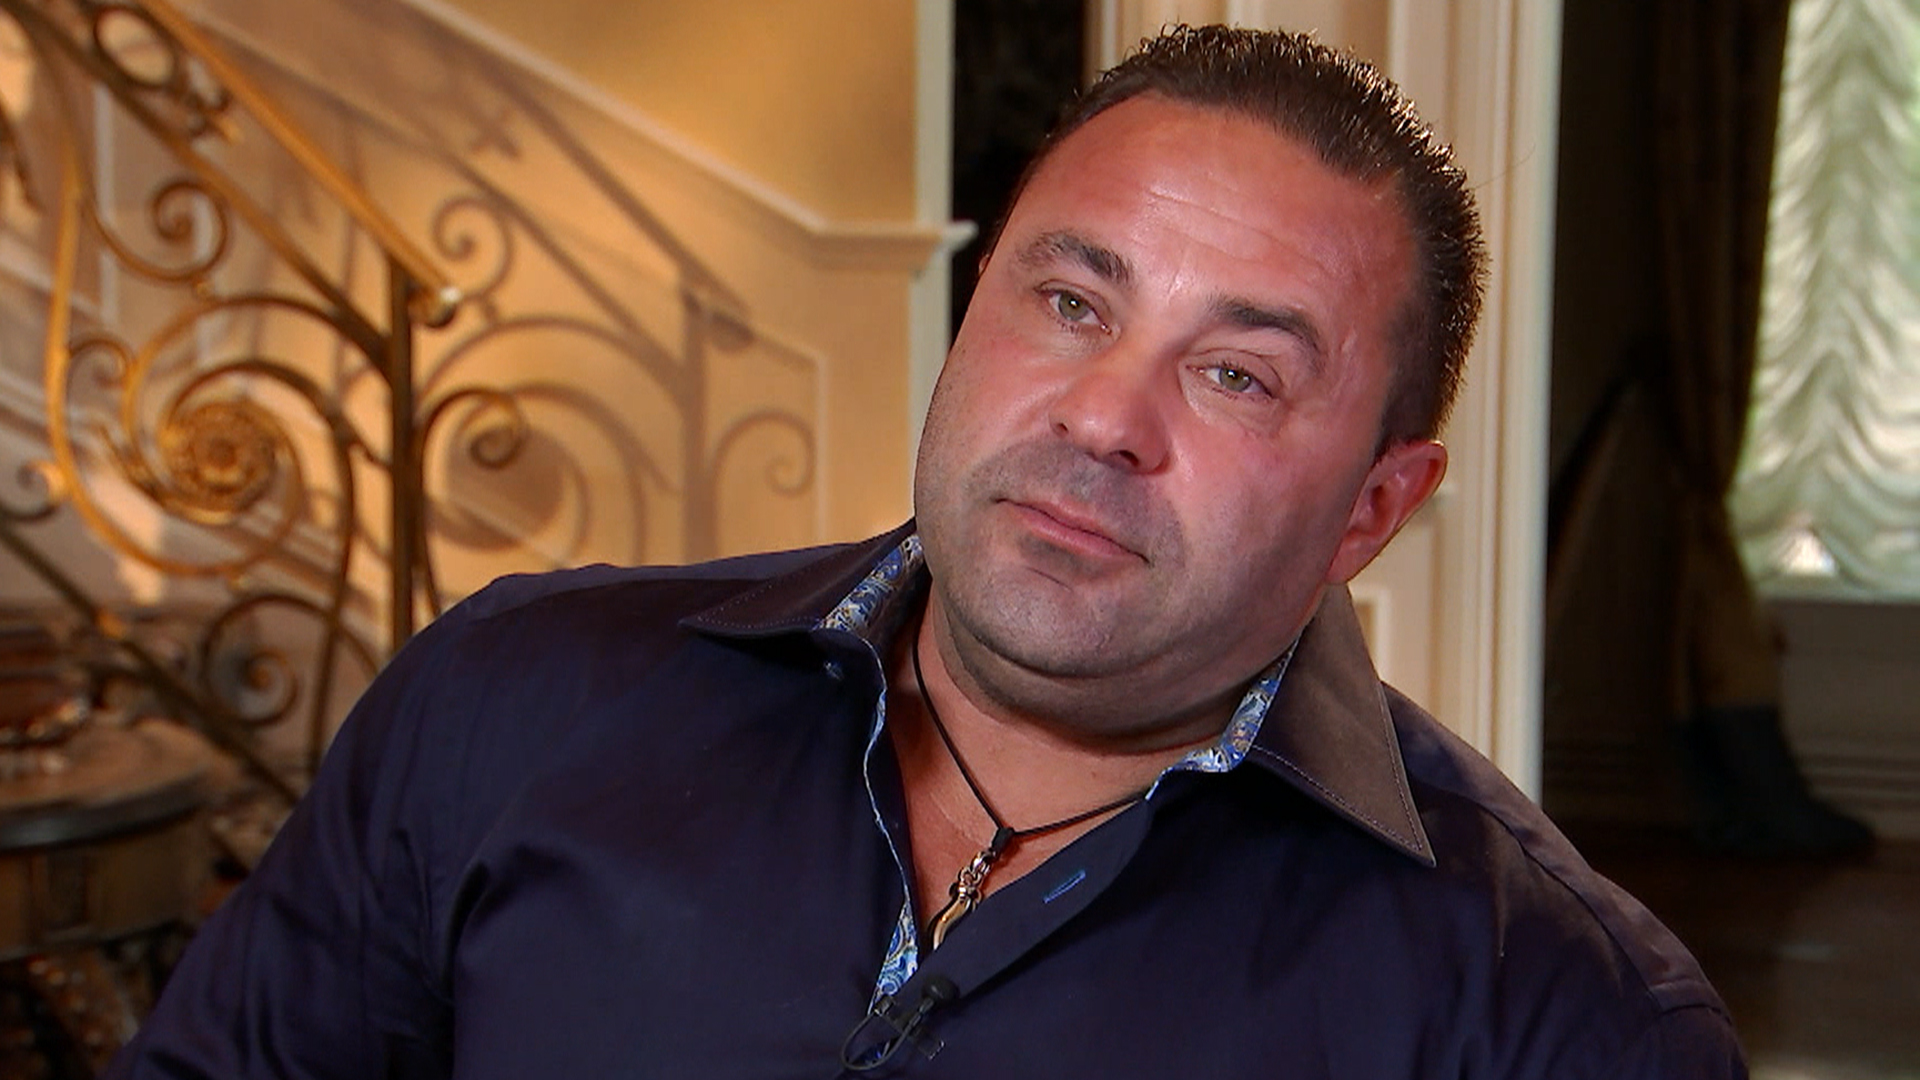 Joe Giudice of 'Real Housewives' on wife Teresa's jail ...